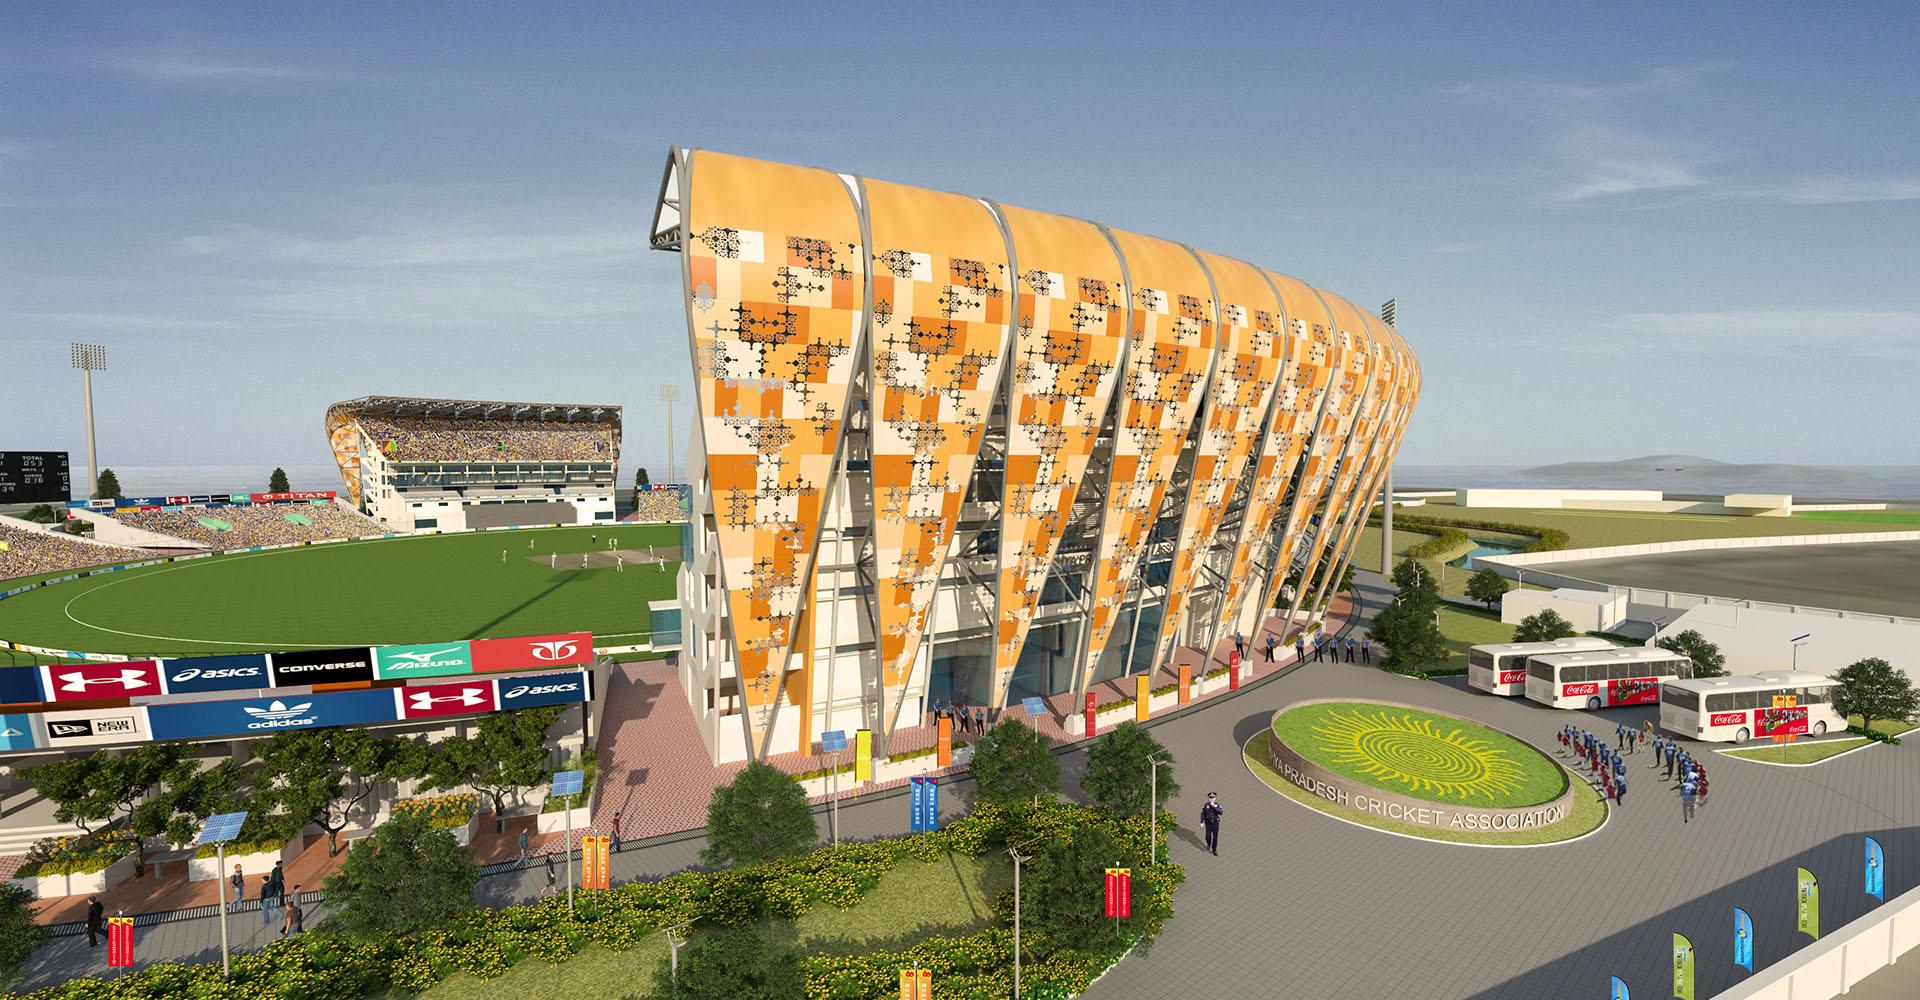 Gwalior Cricket Stadium for Madhya Pradesh Cricket Association (MPCA)-Institutional & Commercial 2